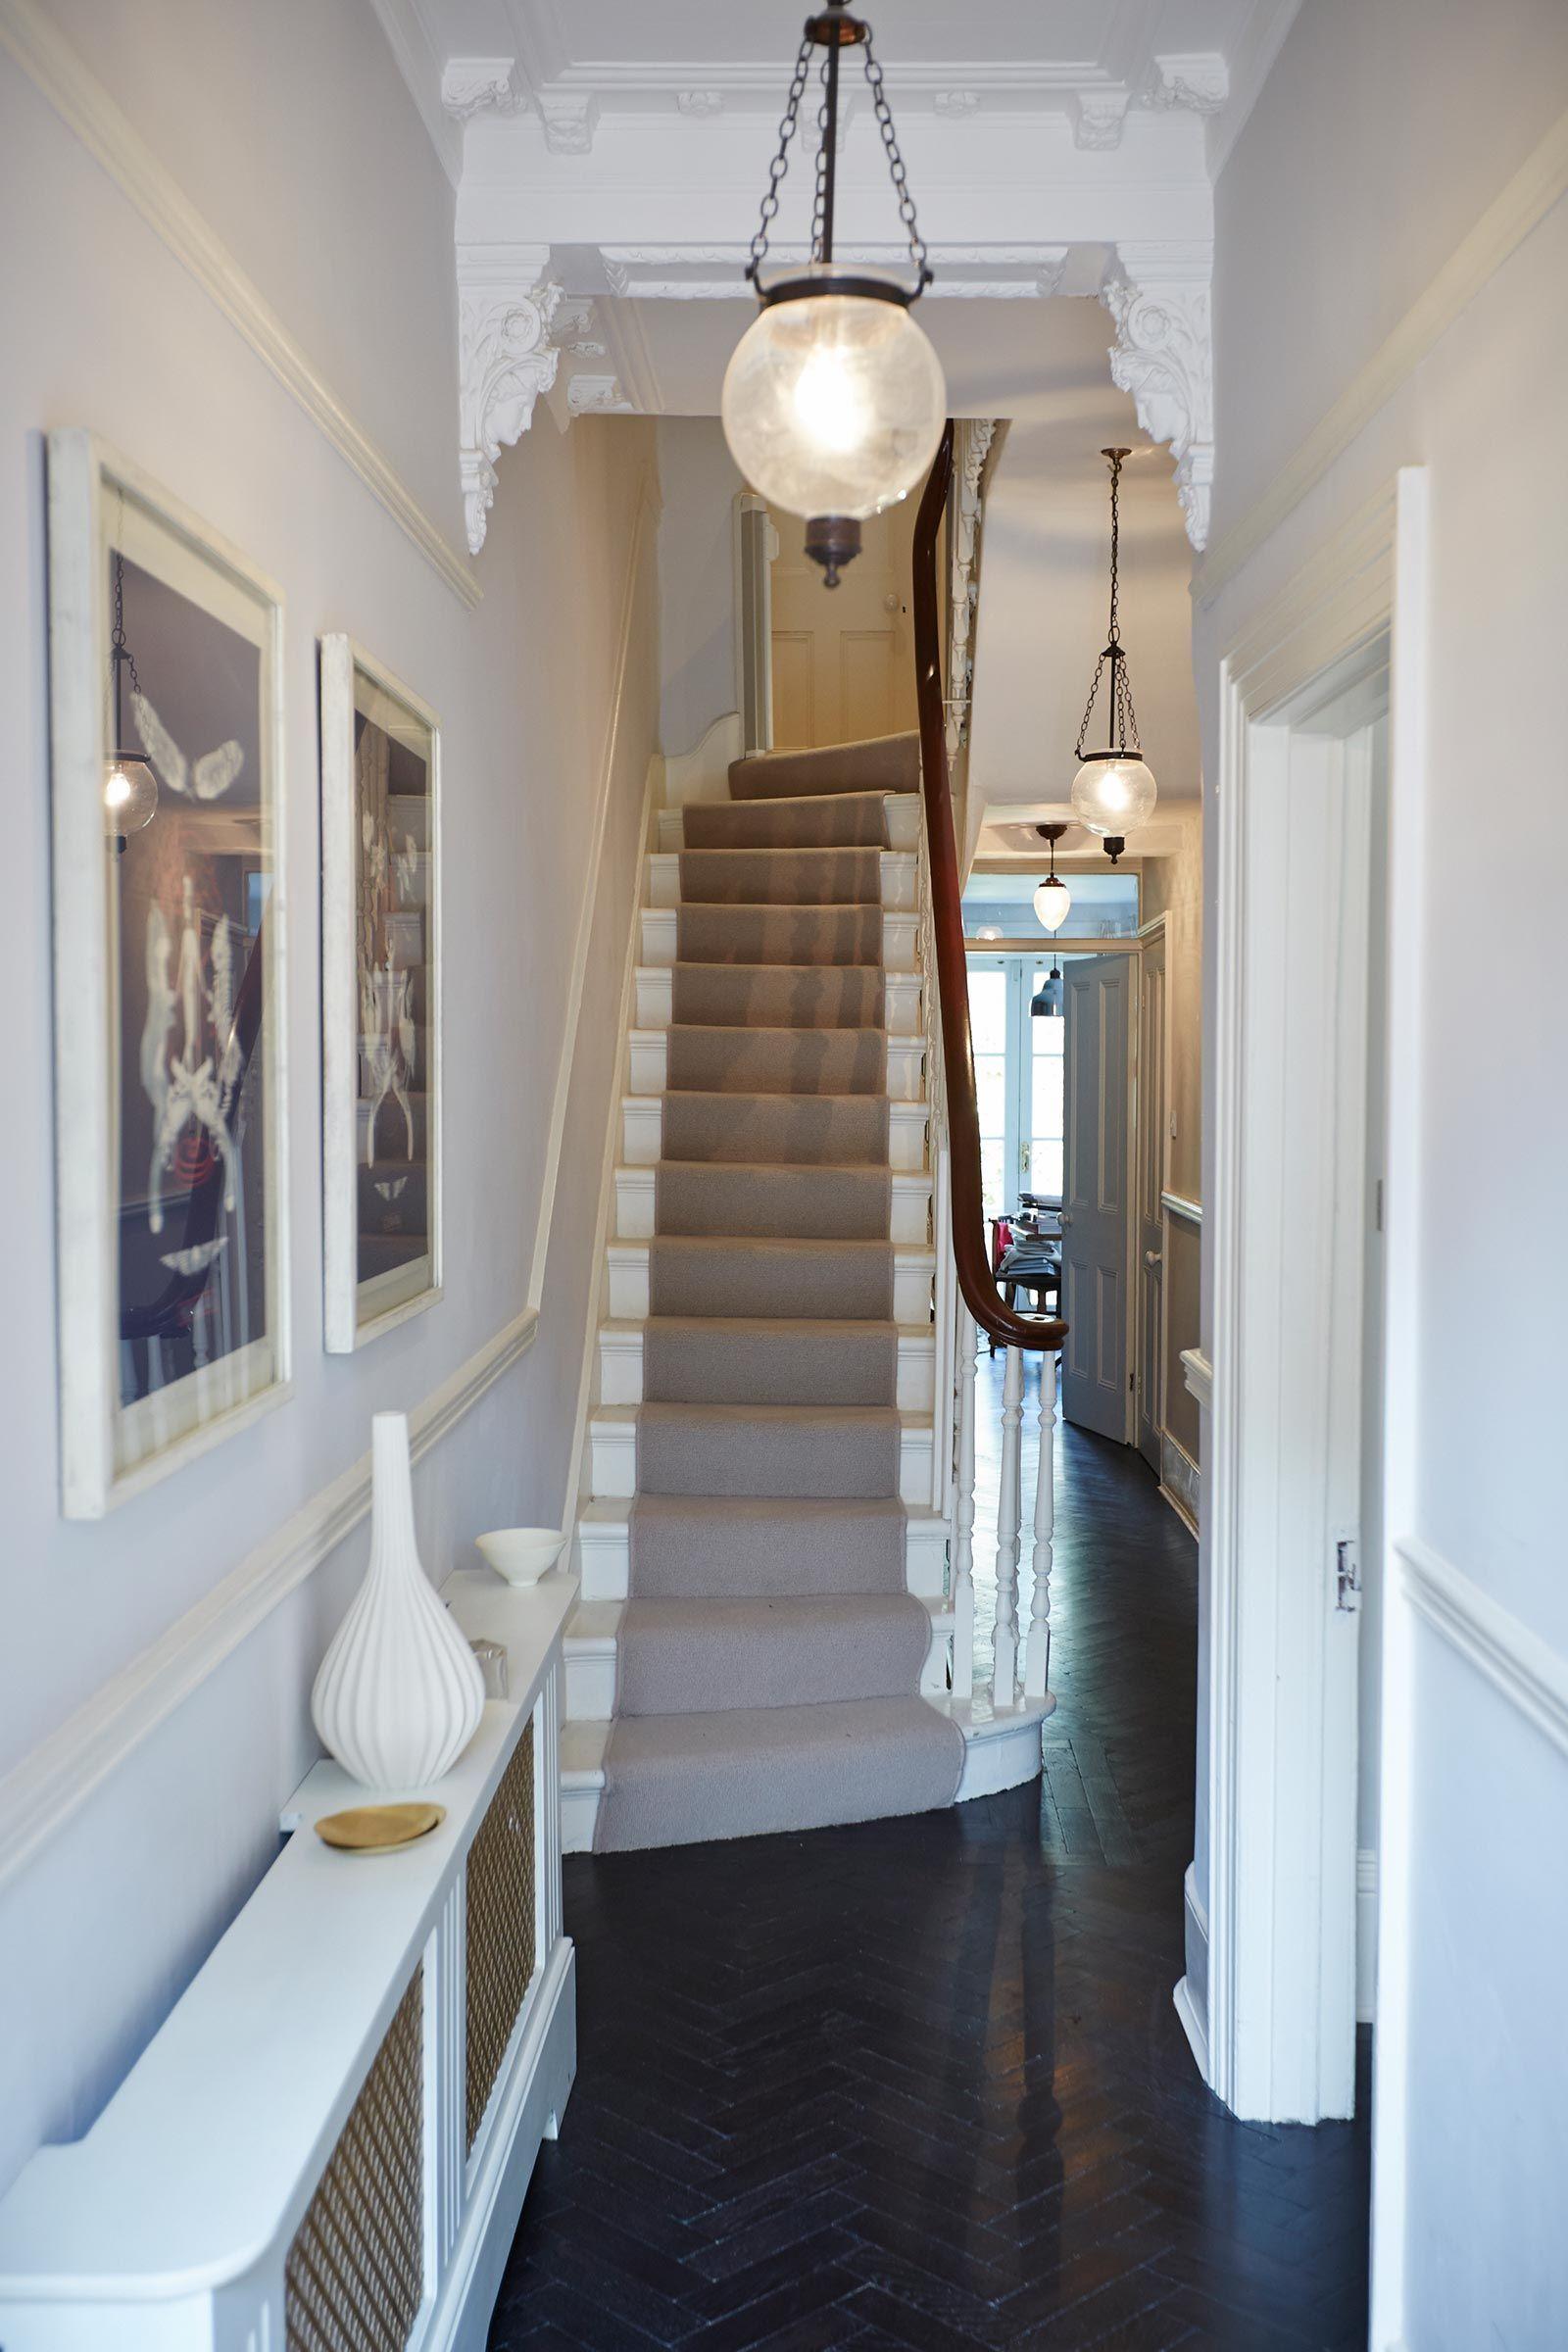 Same Hall Layout Parquet Flooring Glass Pendants Modern Hallway